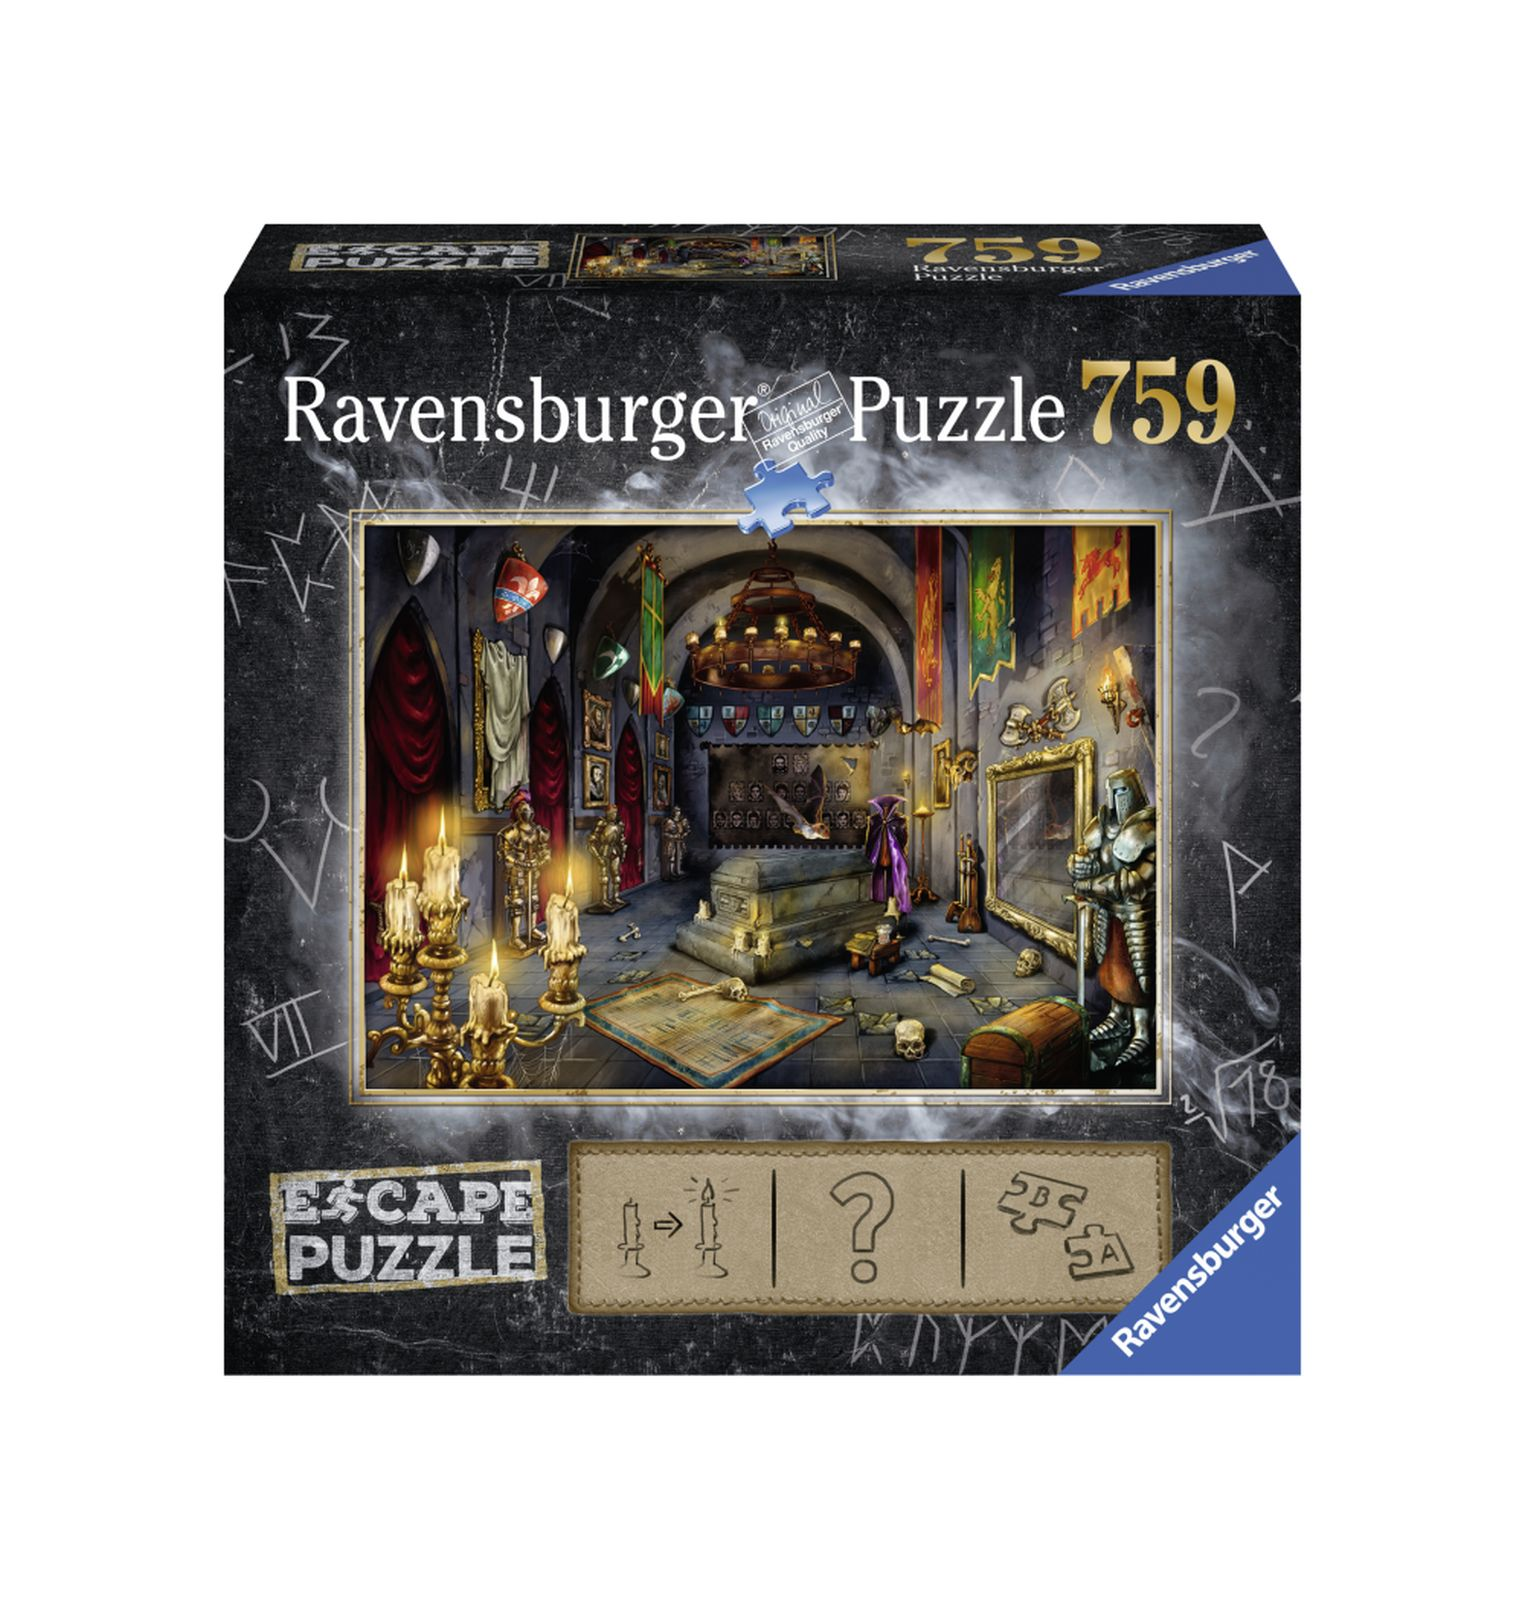 Ravensburger escape the puzzle - vampiro - Ravensburger1